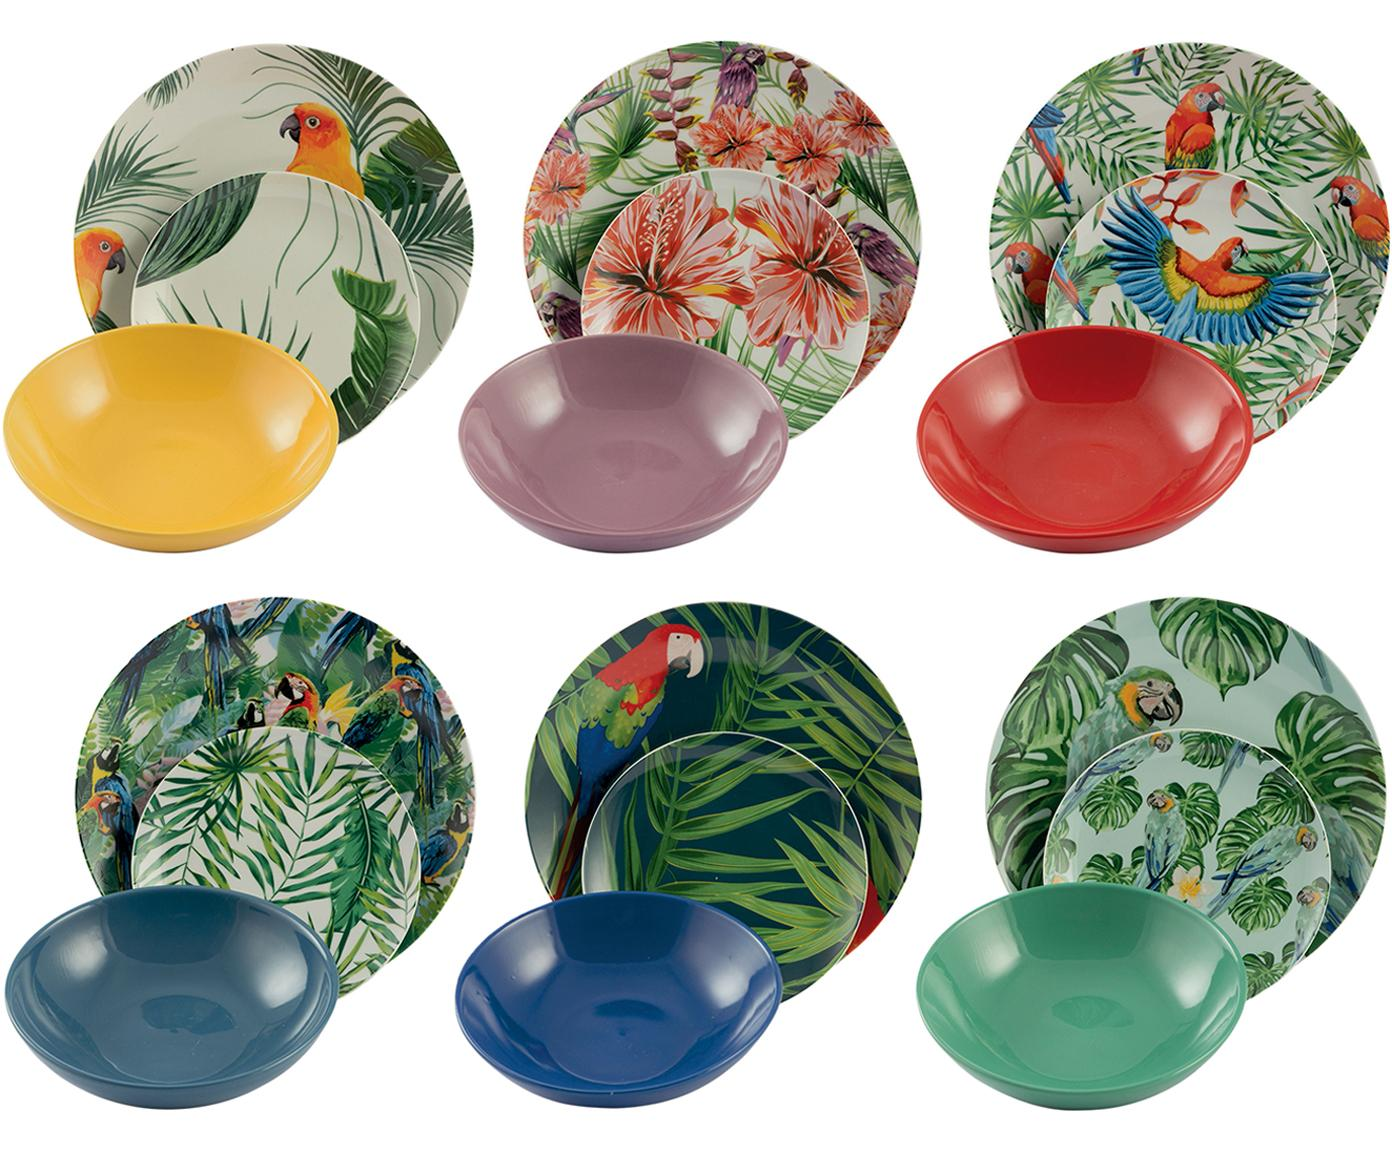 Bordenset Parrot Jungle, 18-delig, Porselein, Multicolour, Verschillende formaten